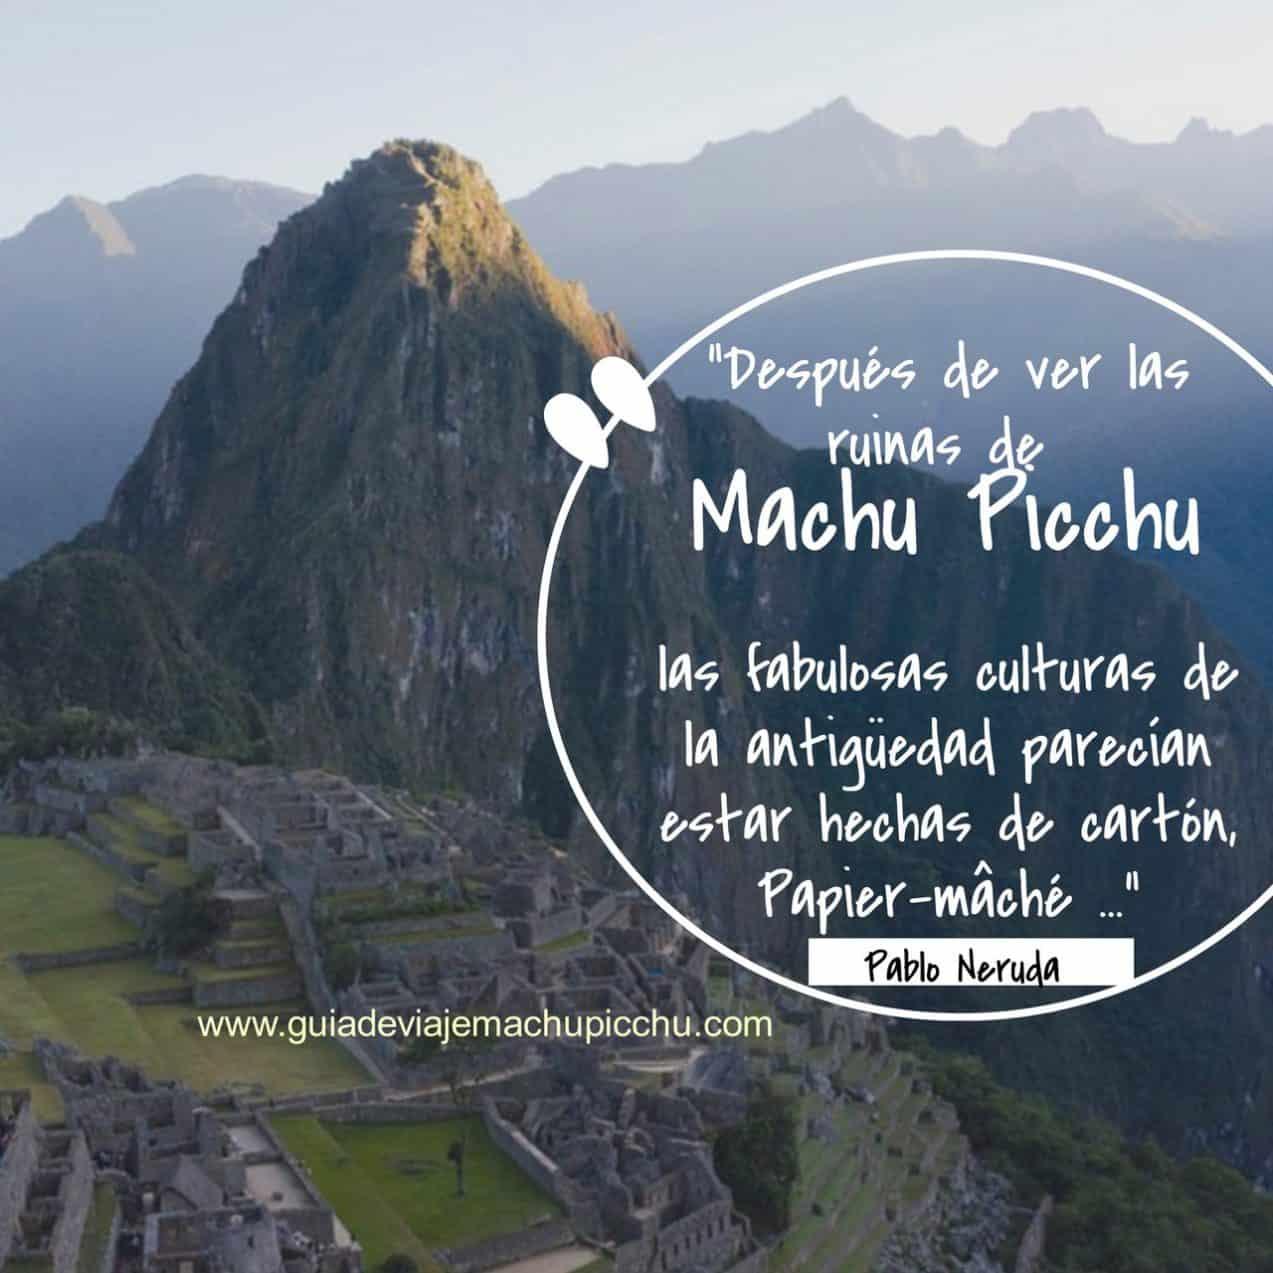 Machu Picchu inspiró a Pablo Neruda